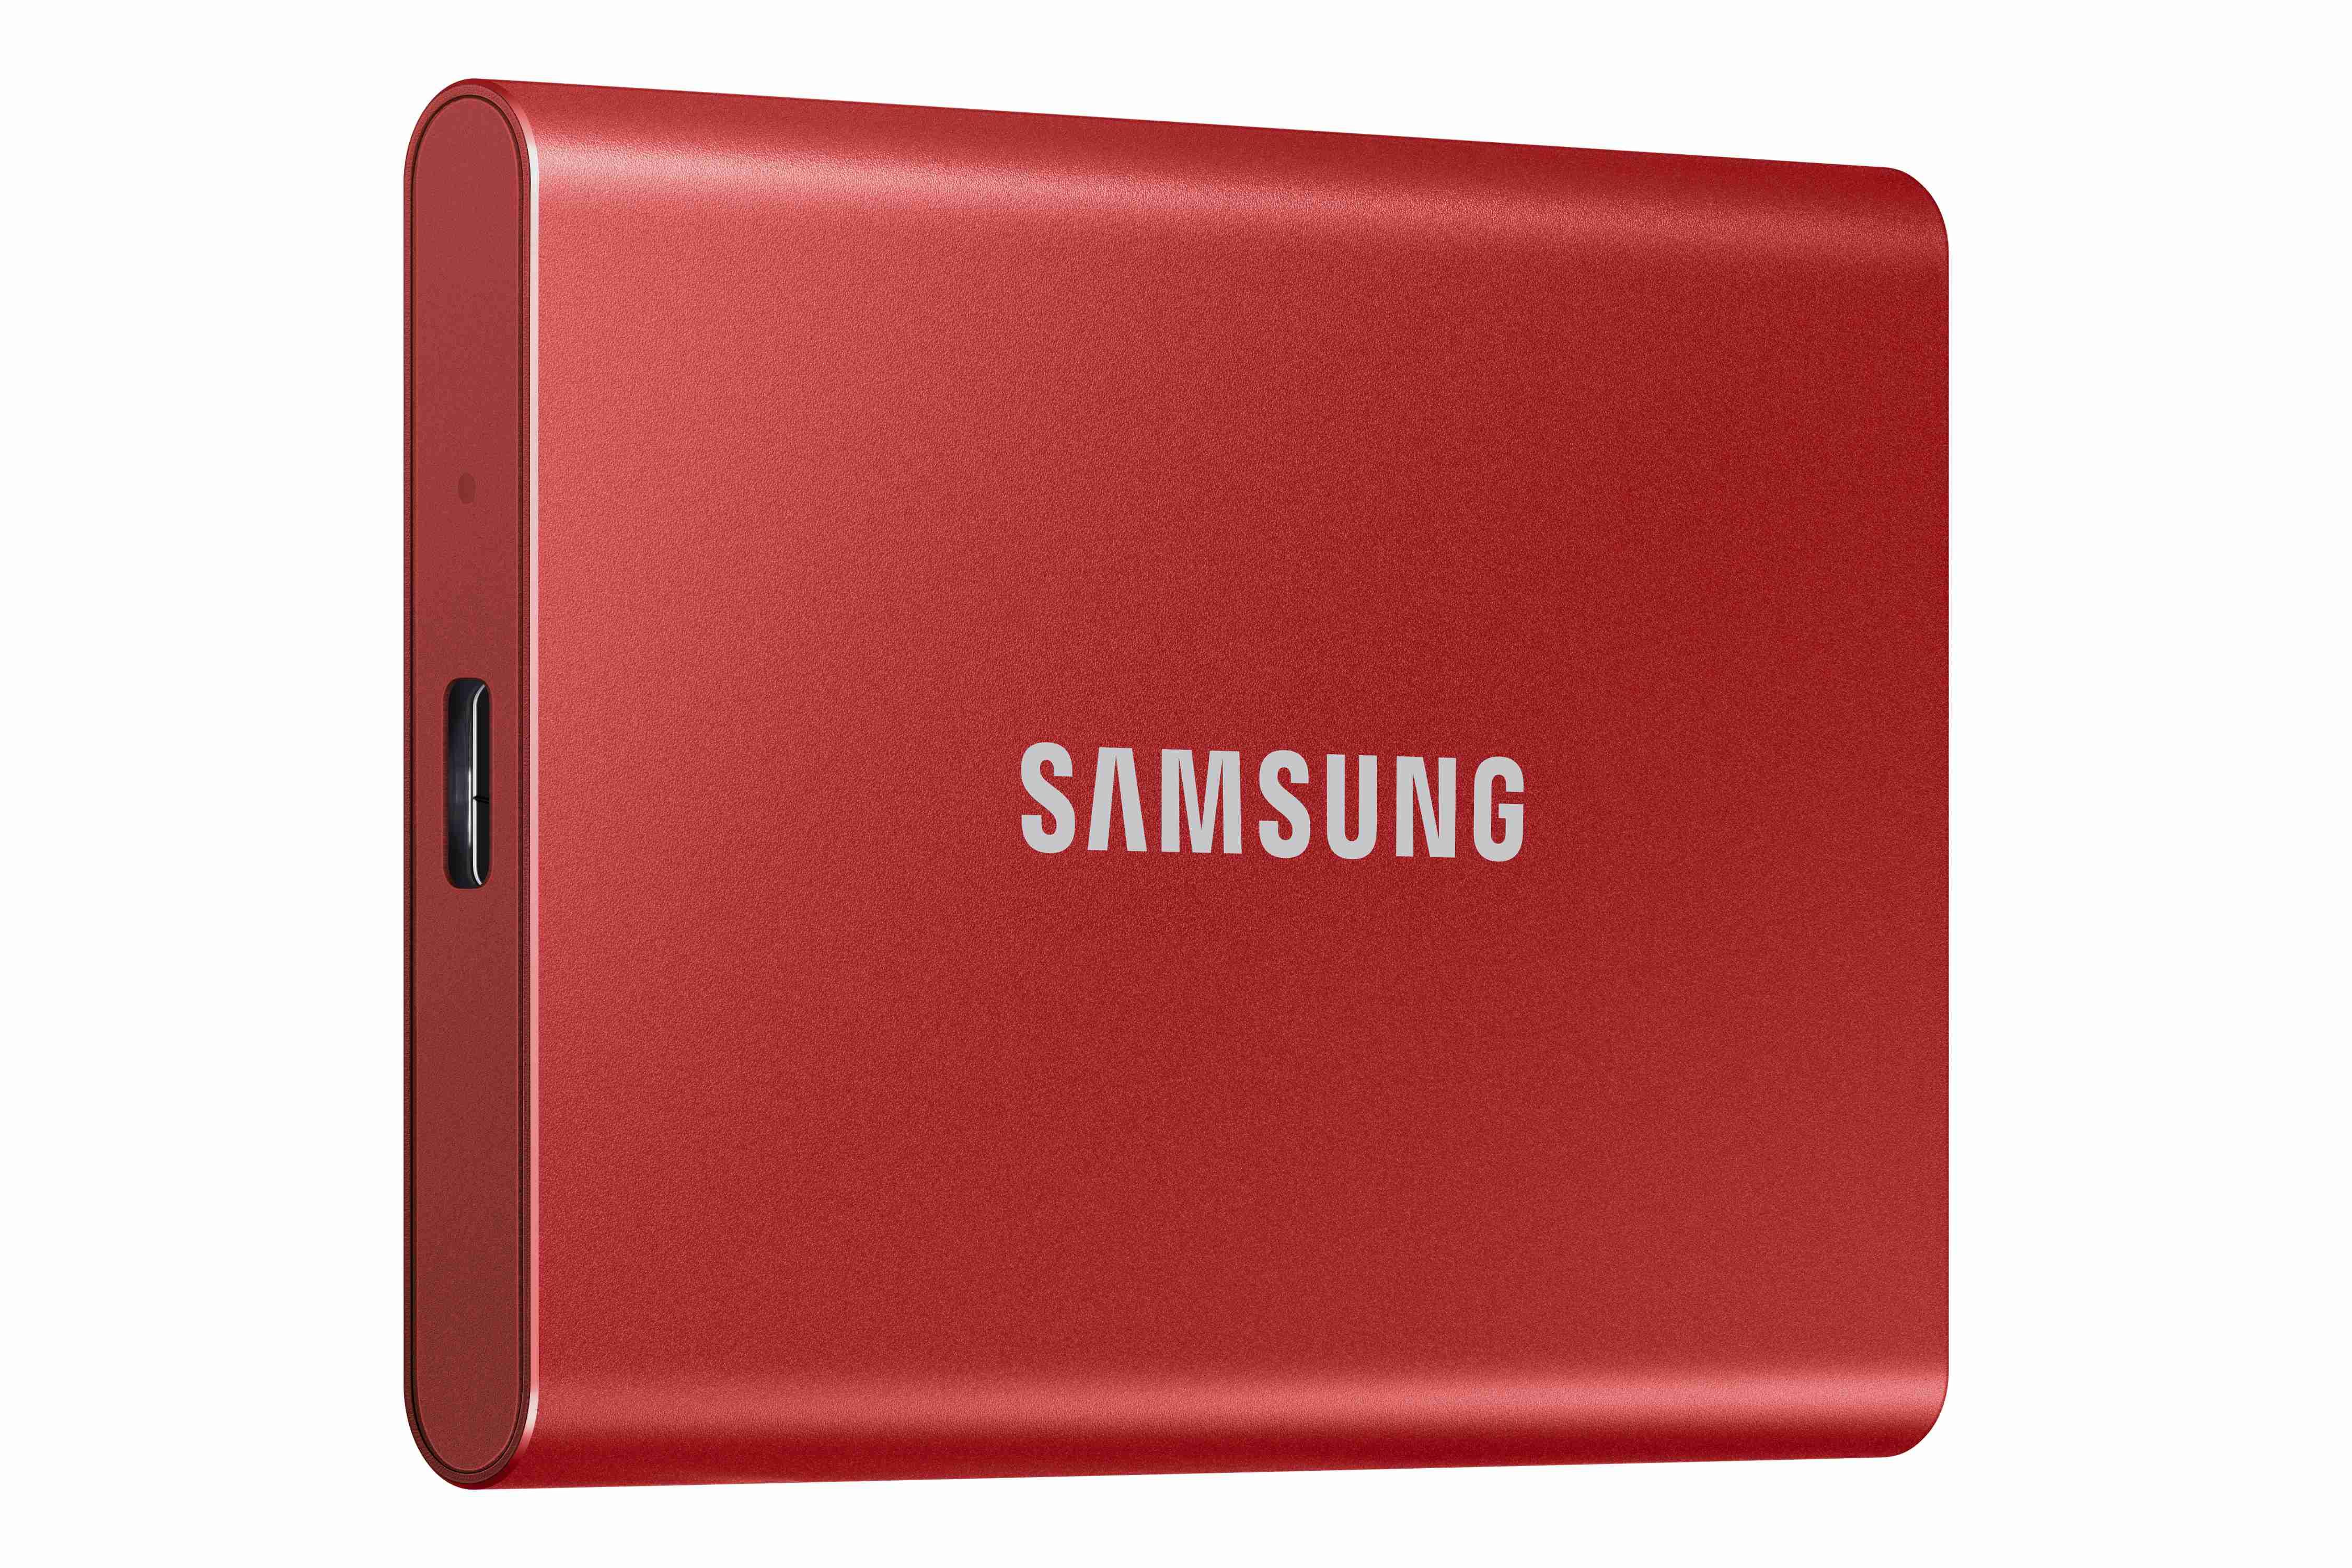 Samsung SSD T7 1